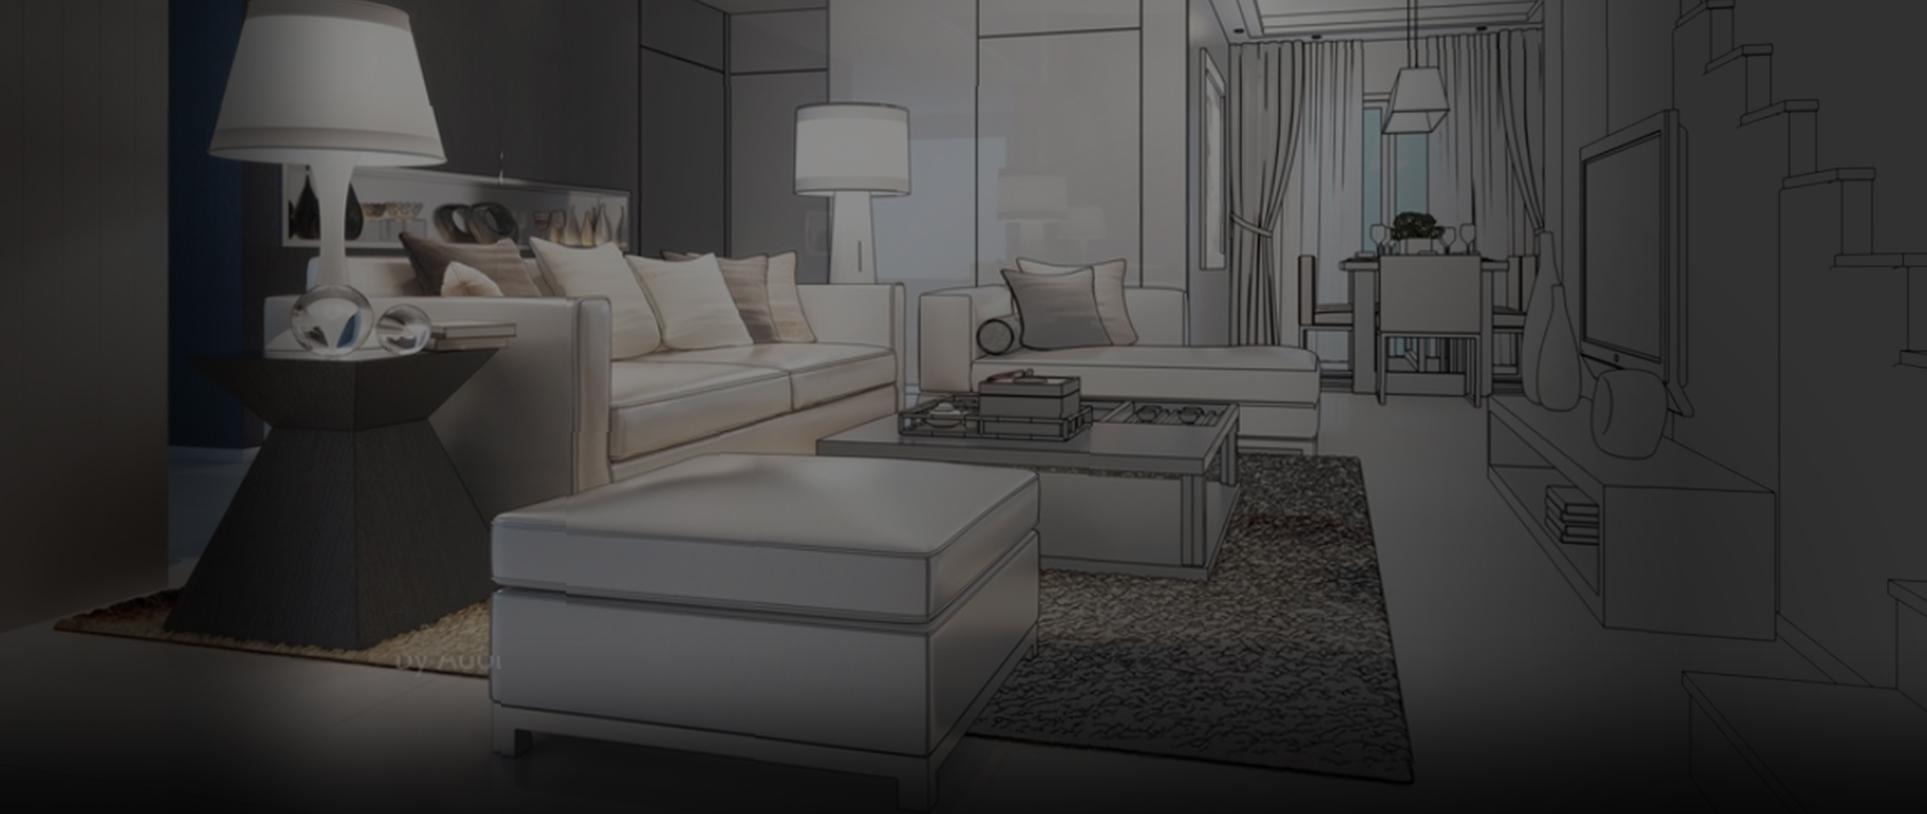 Raumgestaltung Schweiz Hotel Objektplanung